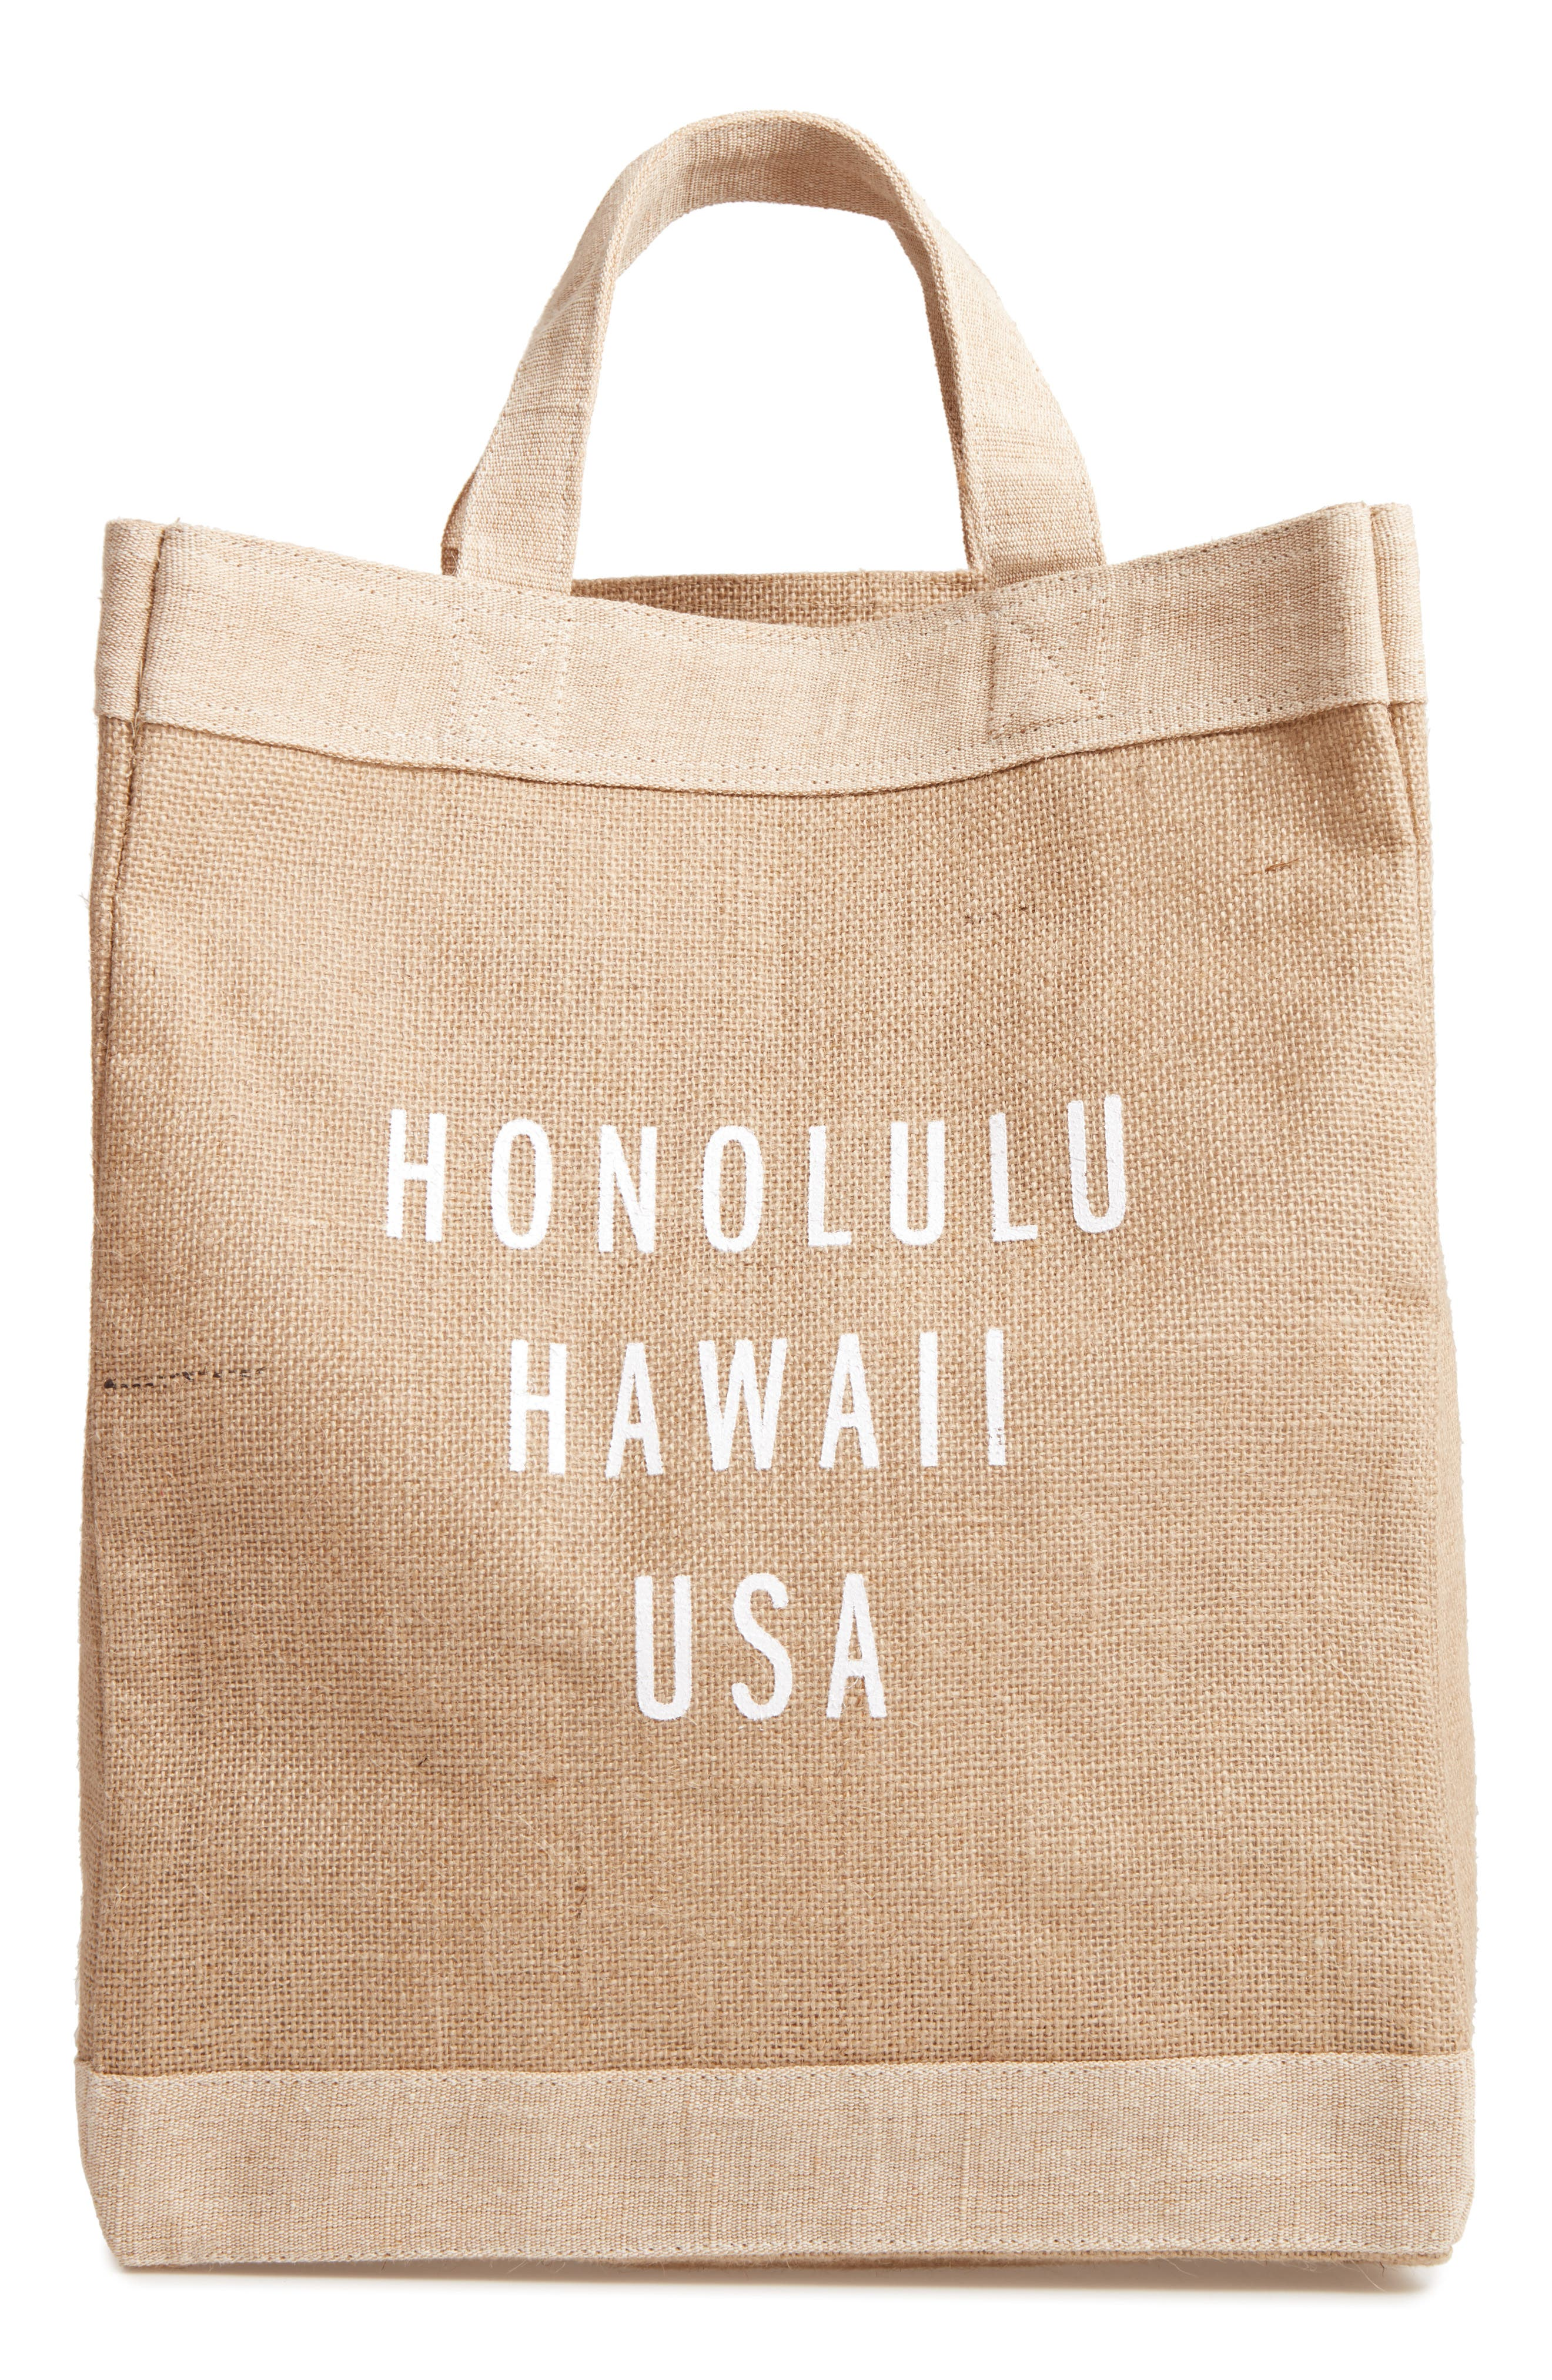 Honolulu Simple Market Bag,                         Main,                         color,